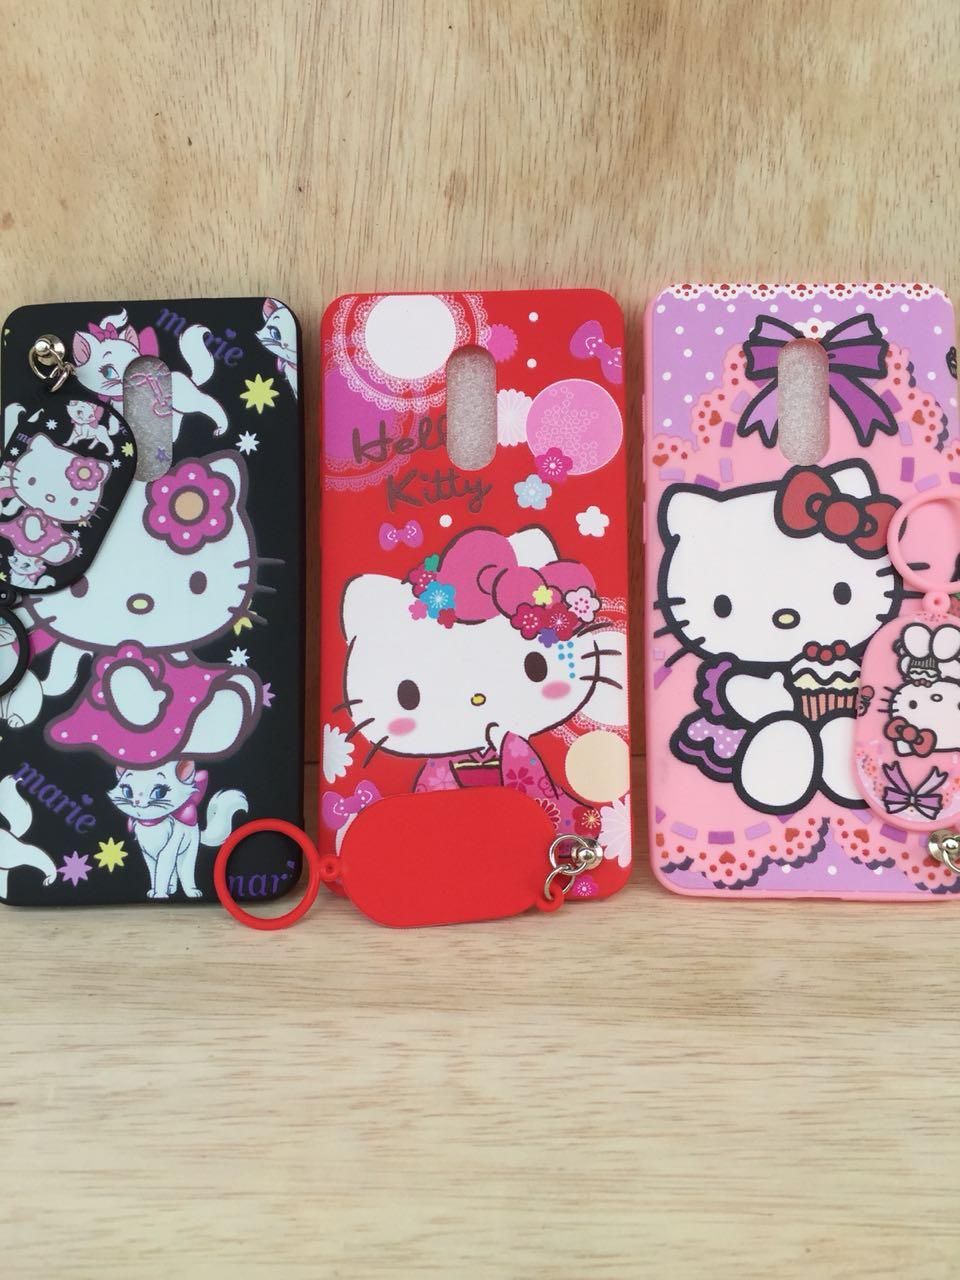 ... Case Softcase Karakter Gantungan Doraemon/Hello Kitty For Xiaomi Redmi Note 4X - 4